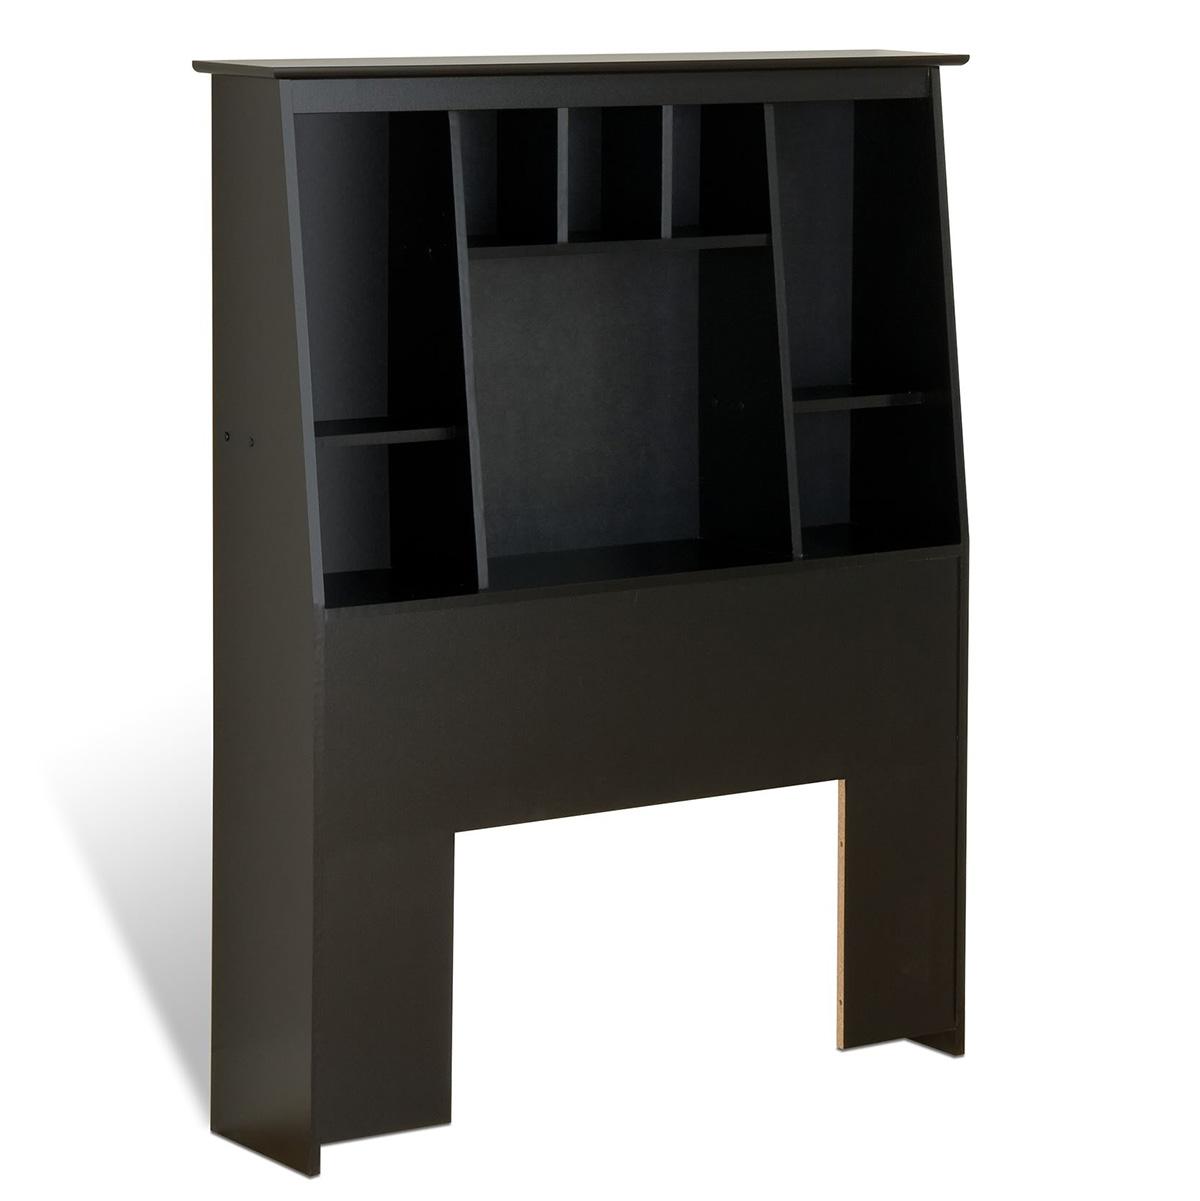 Prepac Slant Back Bookcase Headboard Black